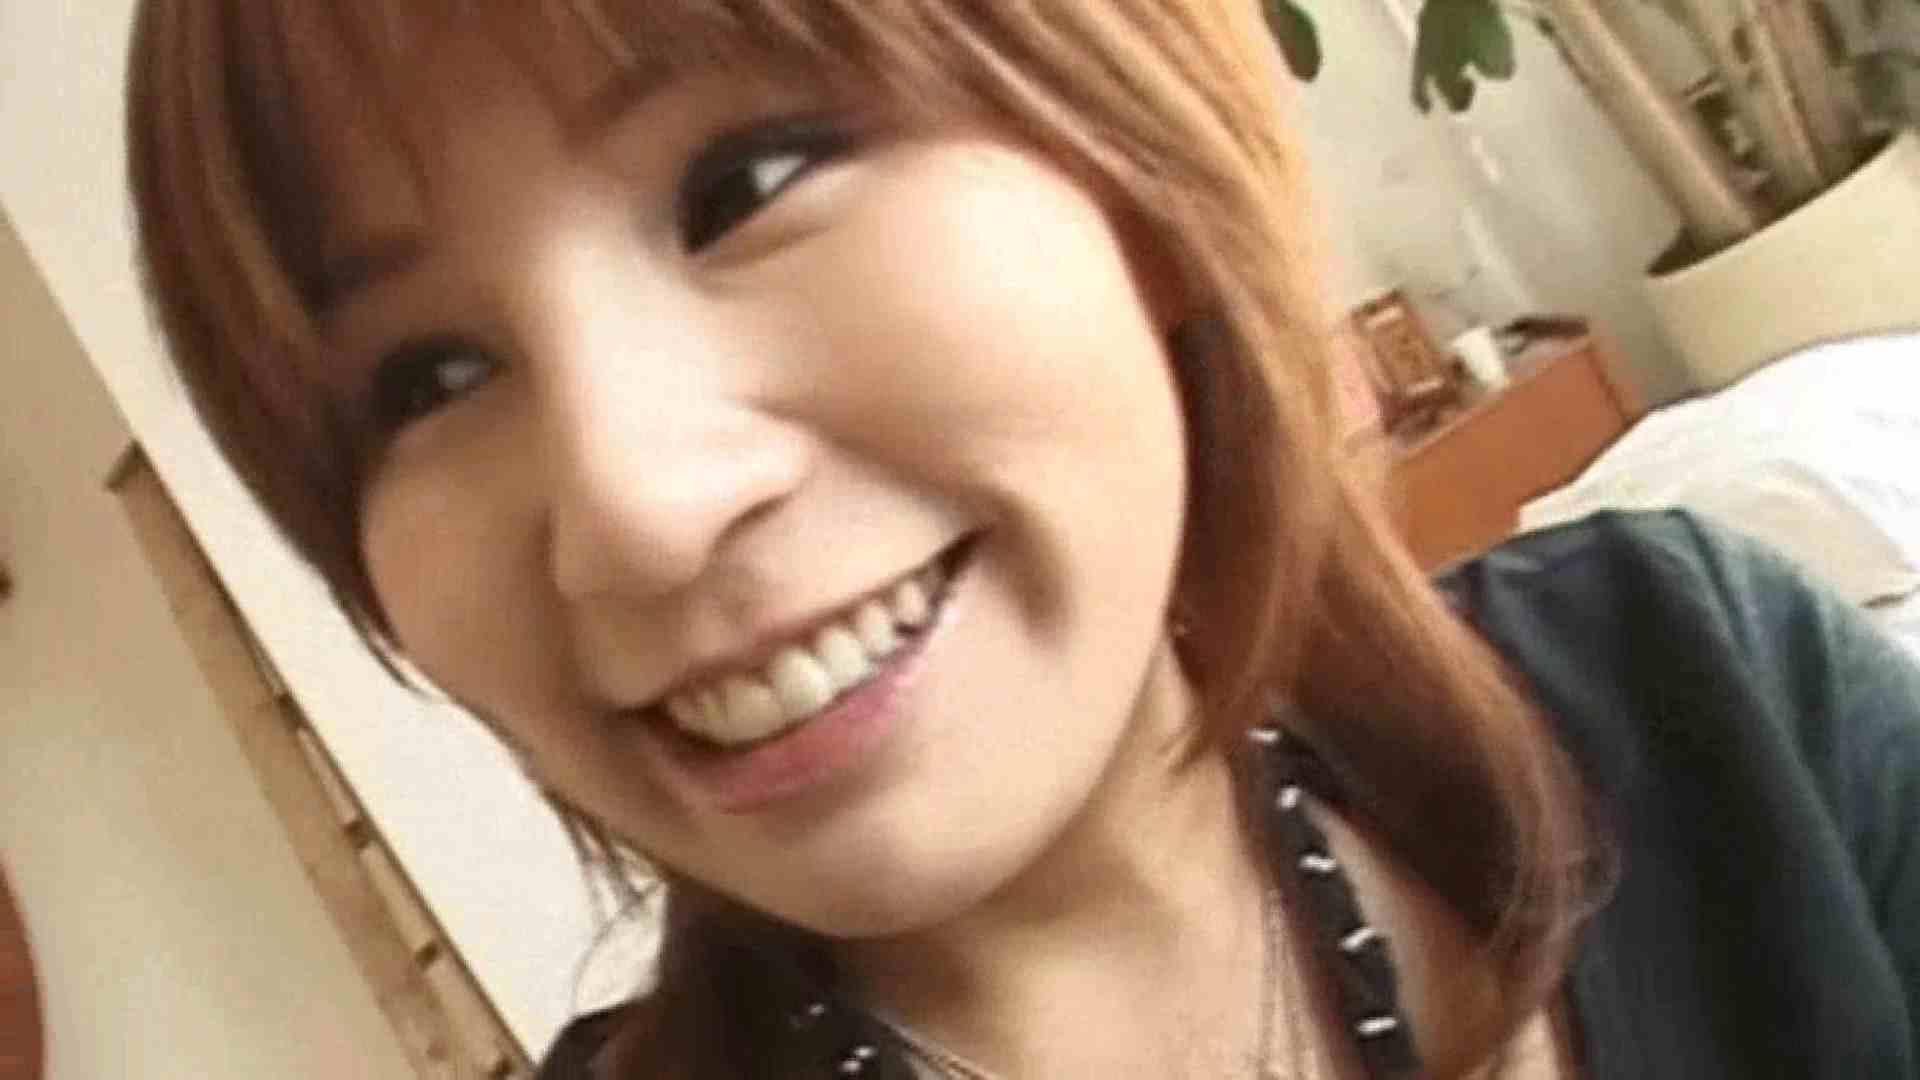 S級厳選美女ビッチガールVol.16 美女丸裸 AV動画キャプチャ 96pic 2